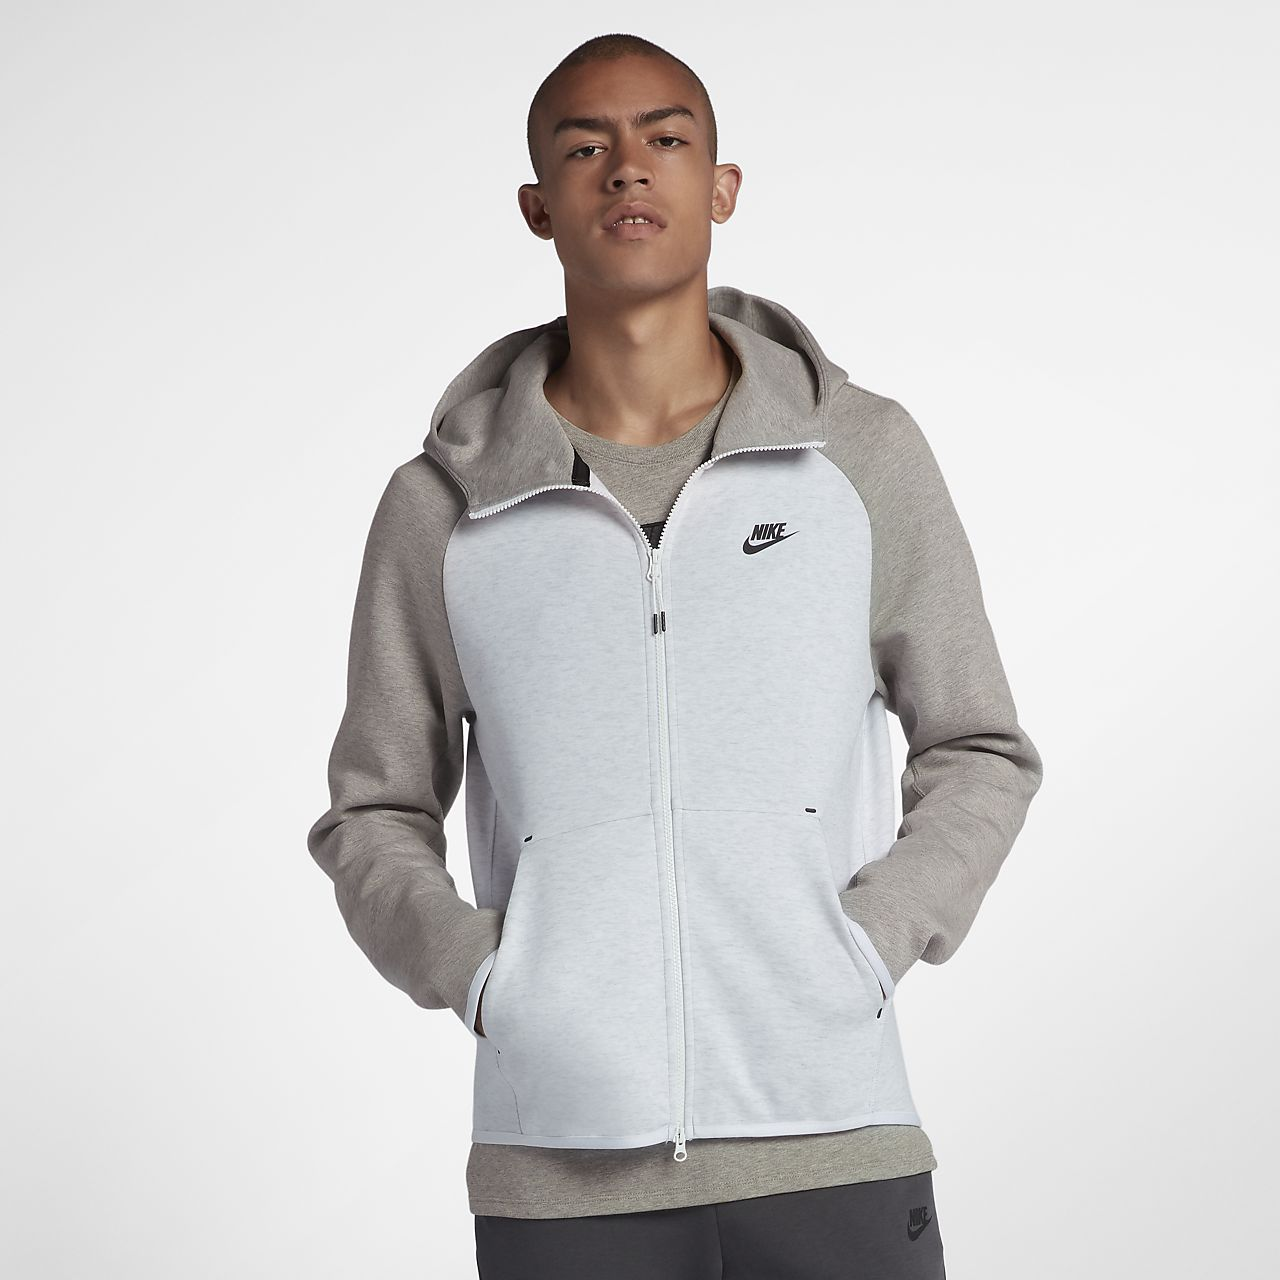 20dadab9bb30 Nike Sportswear Tech Fleece Men s Full-Zip Hoodie. Nike.com GB